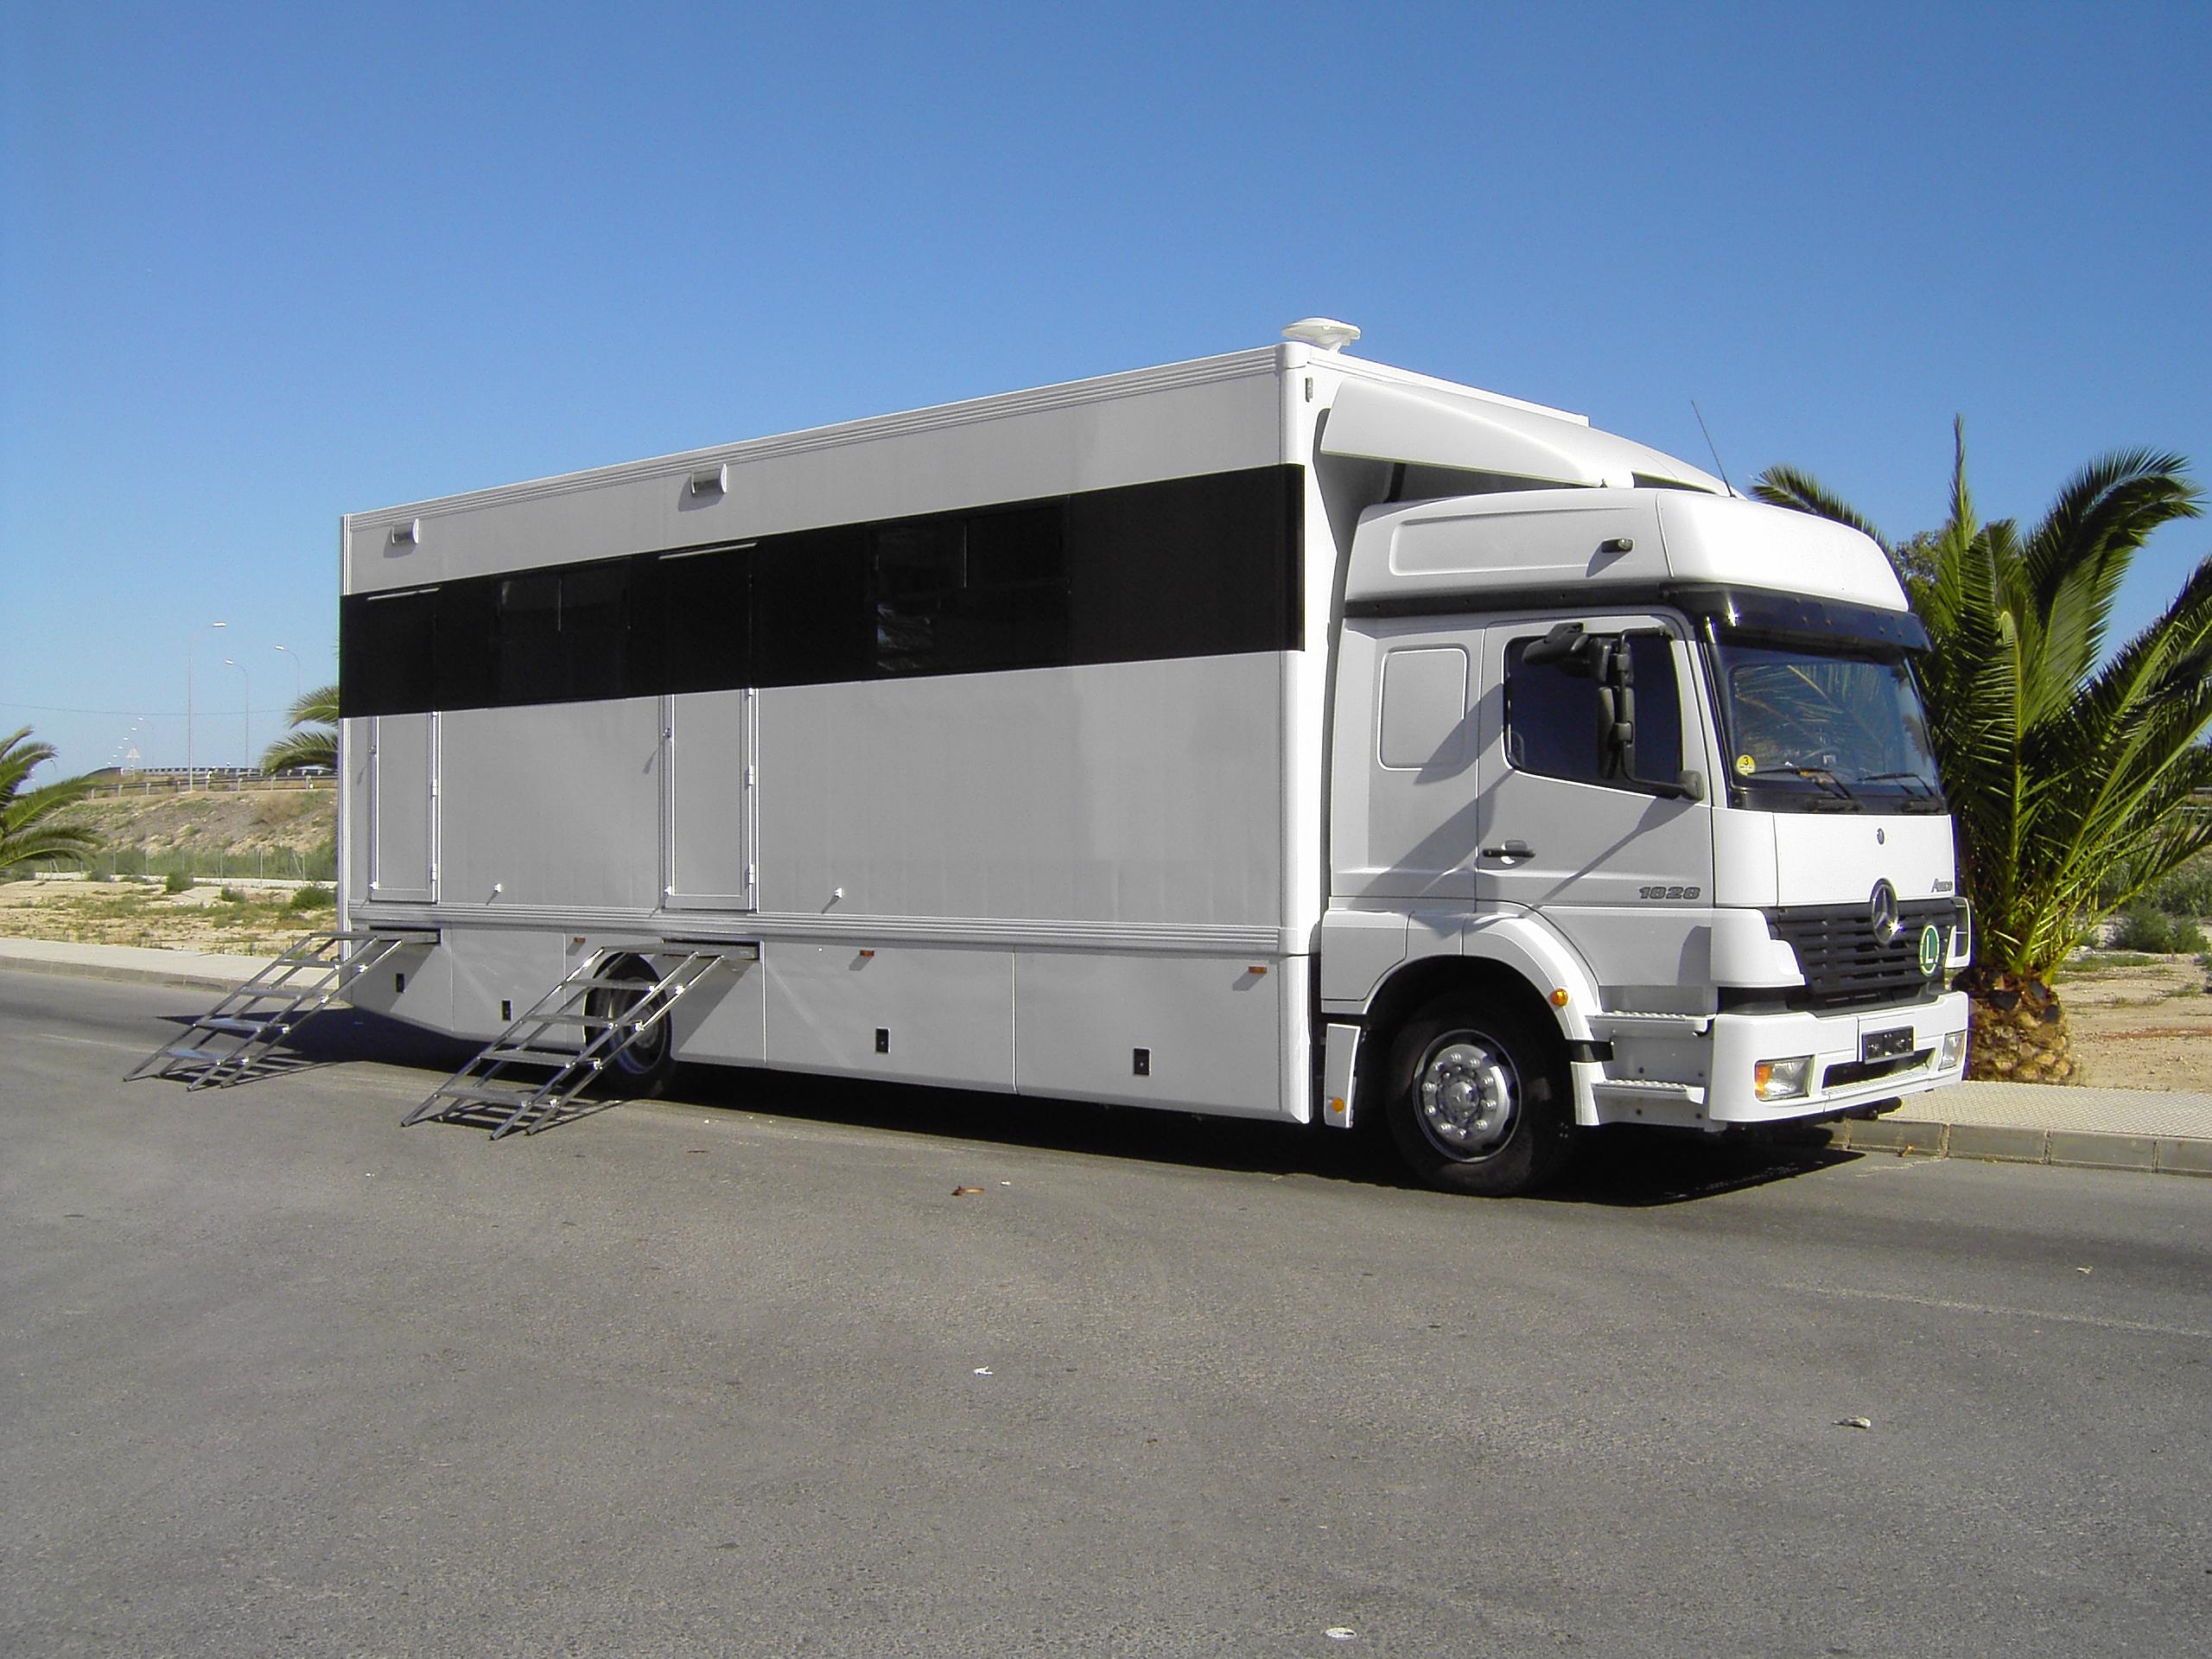 camion racing caravanas costa. Black Bedroom Furniture Sets. Home Design Ideas